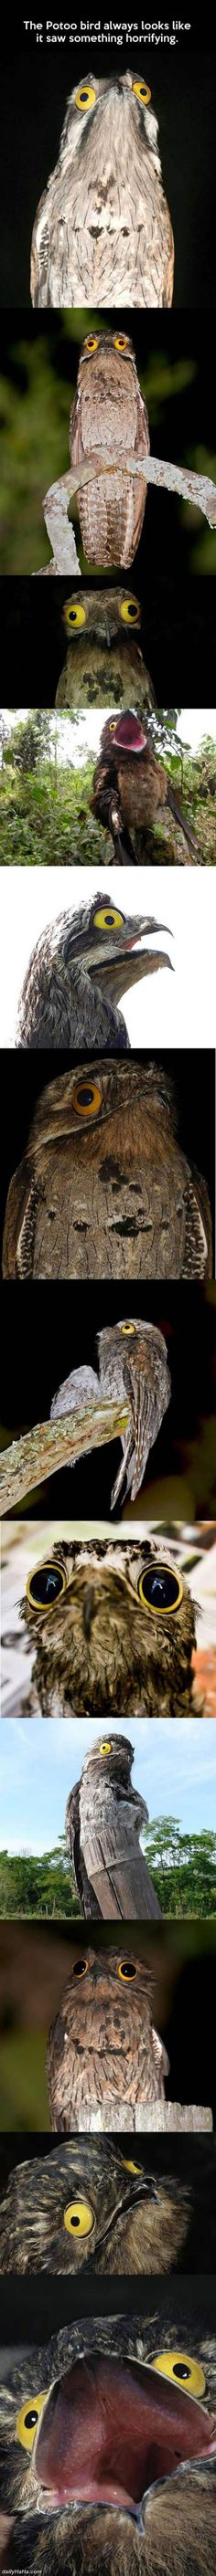 potoo_bird_funny_picture